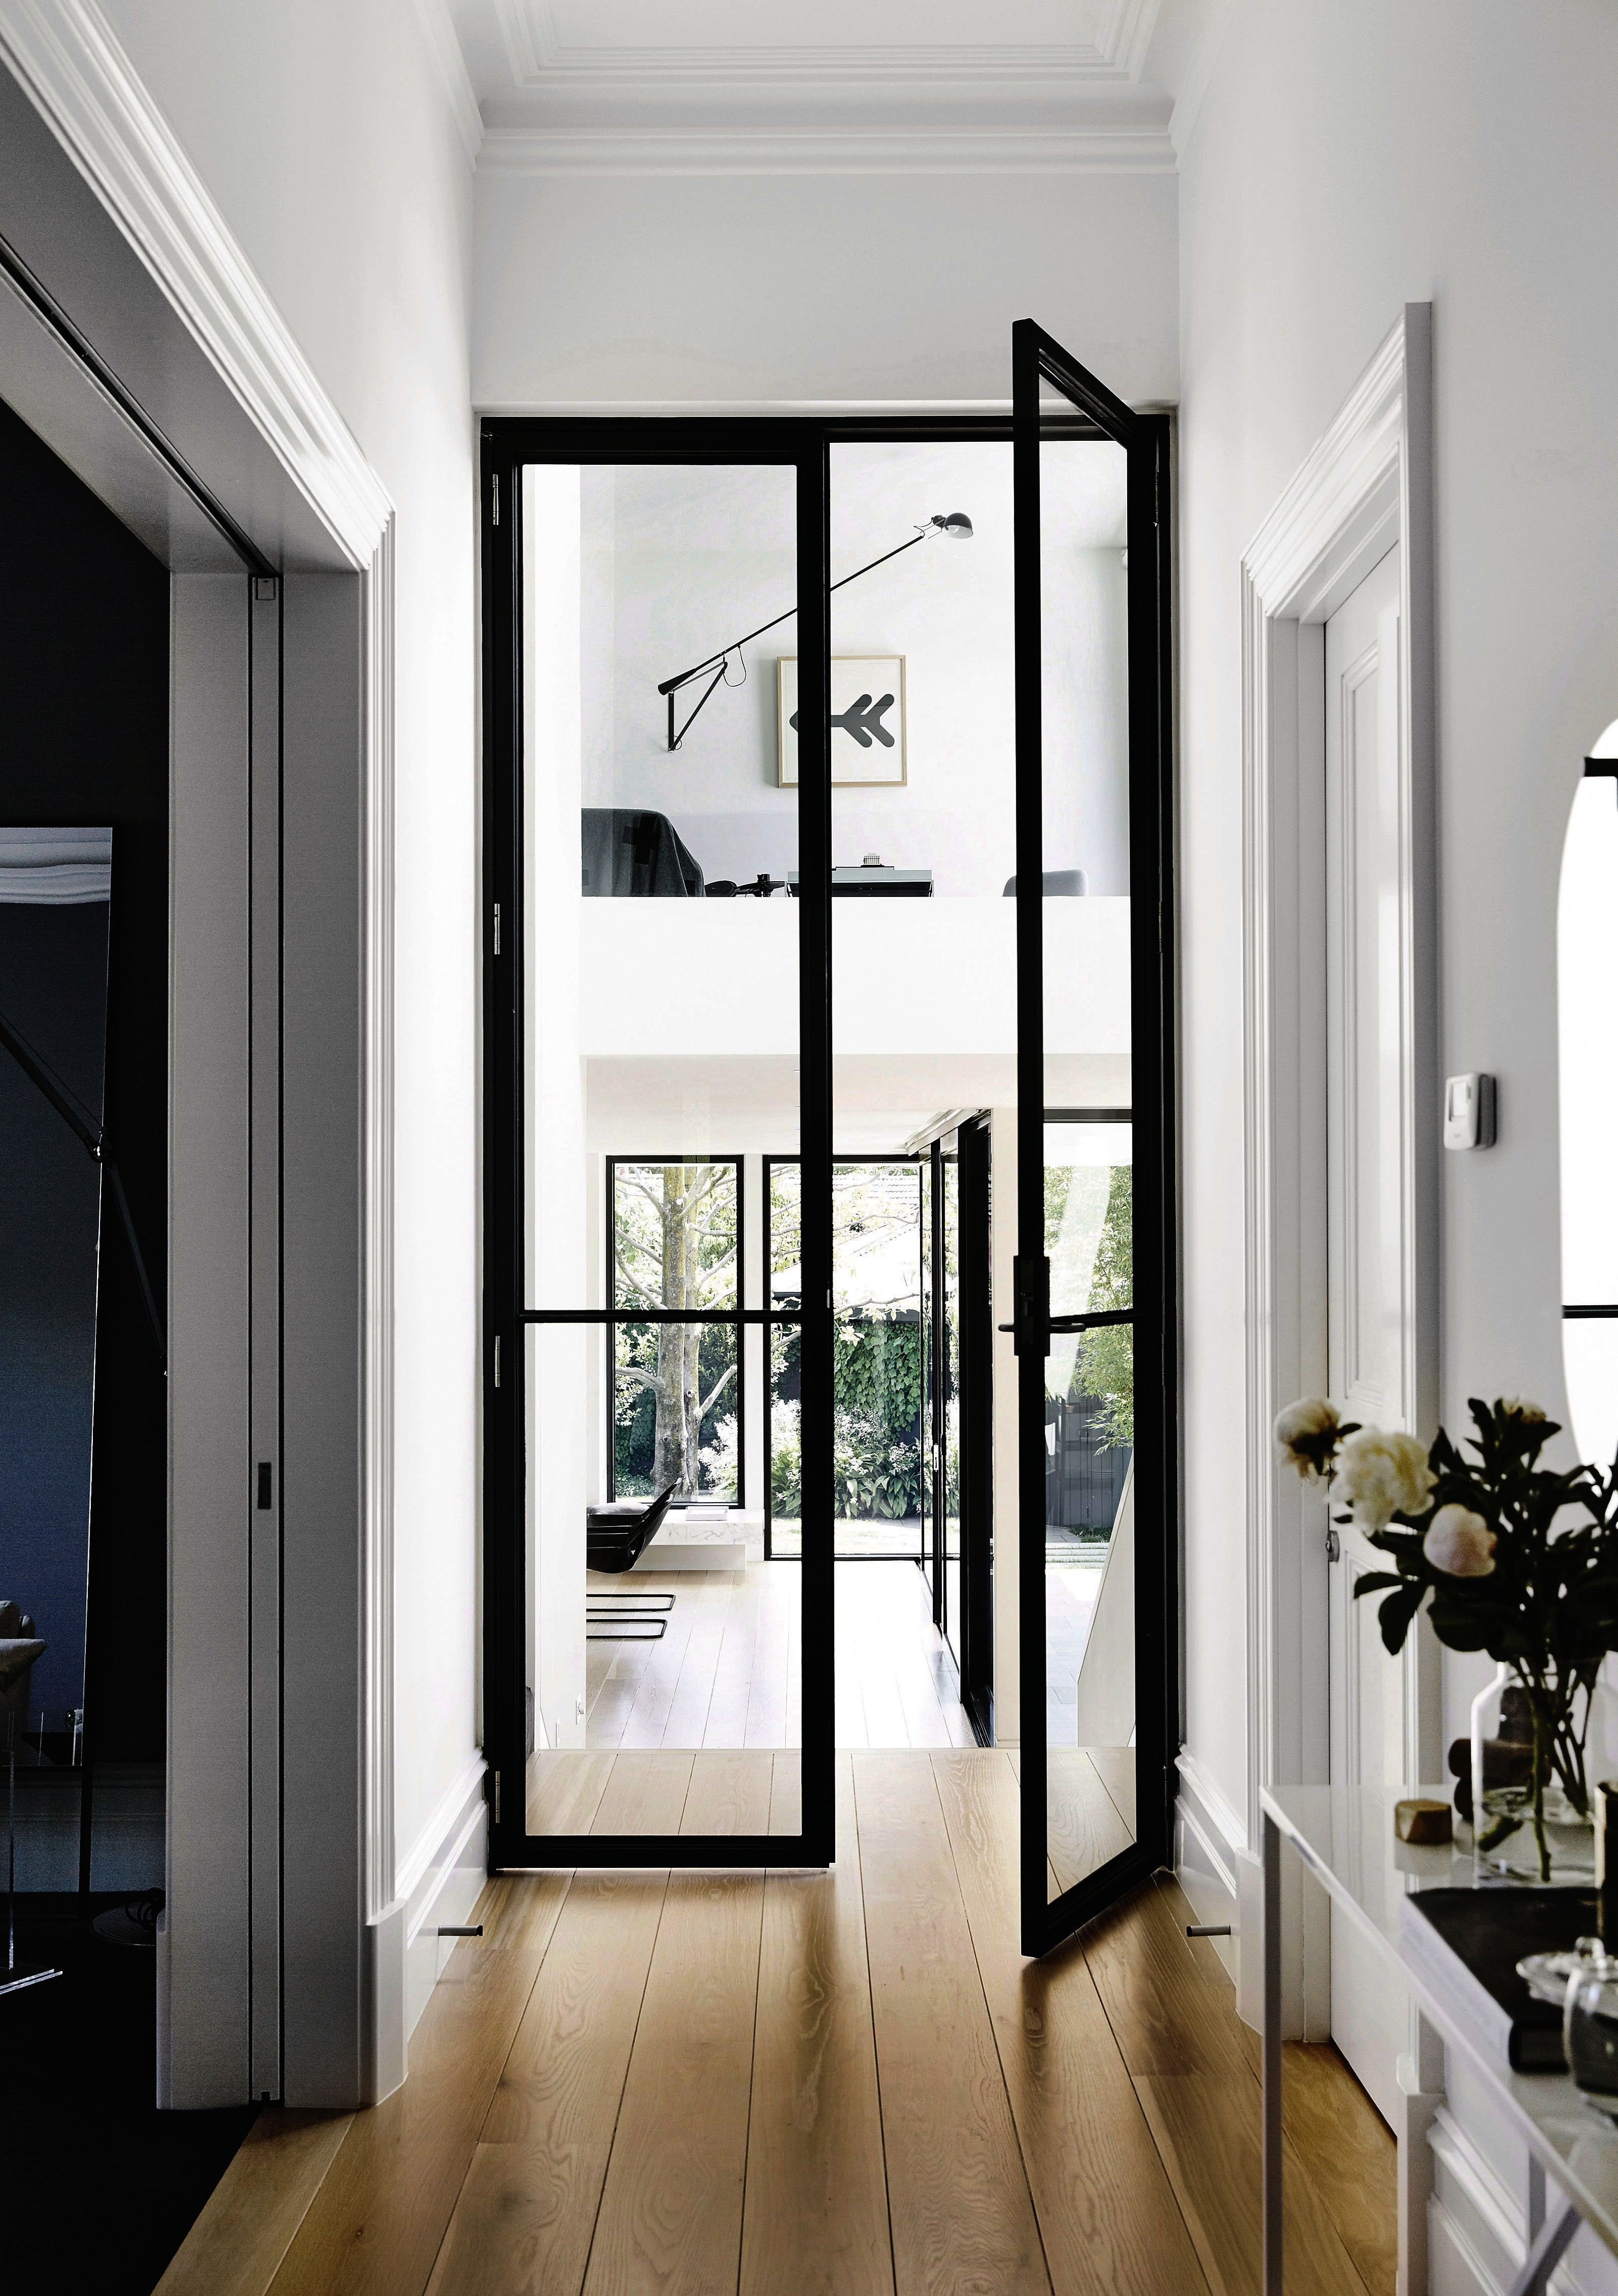 No way interior home designer salary also decor pinterest rh